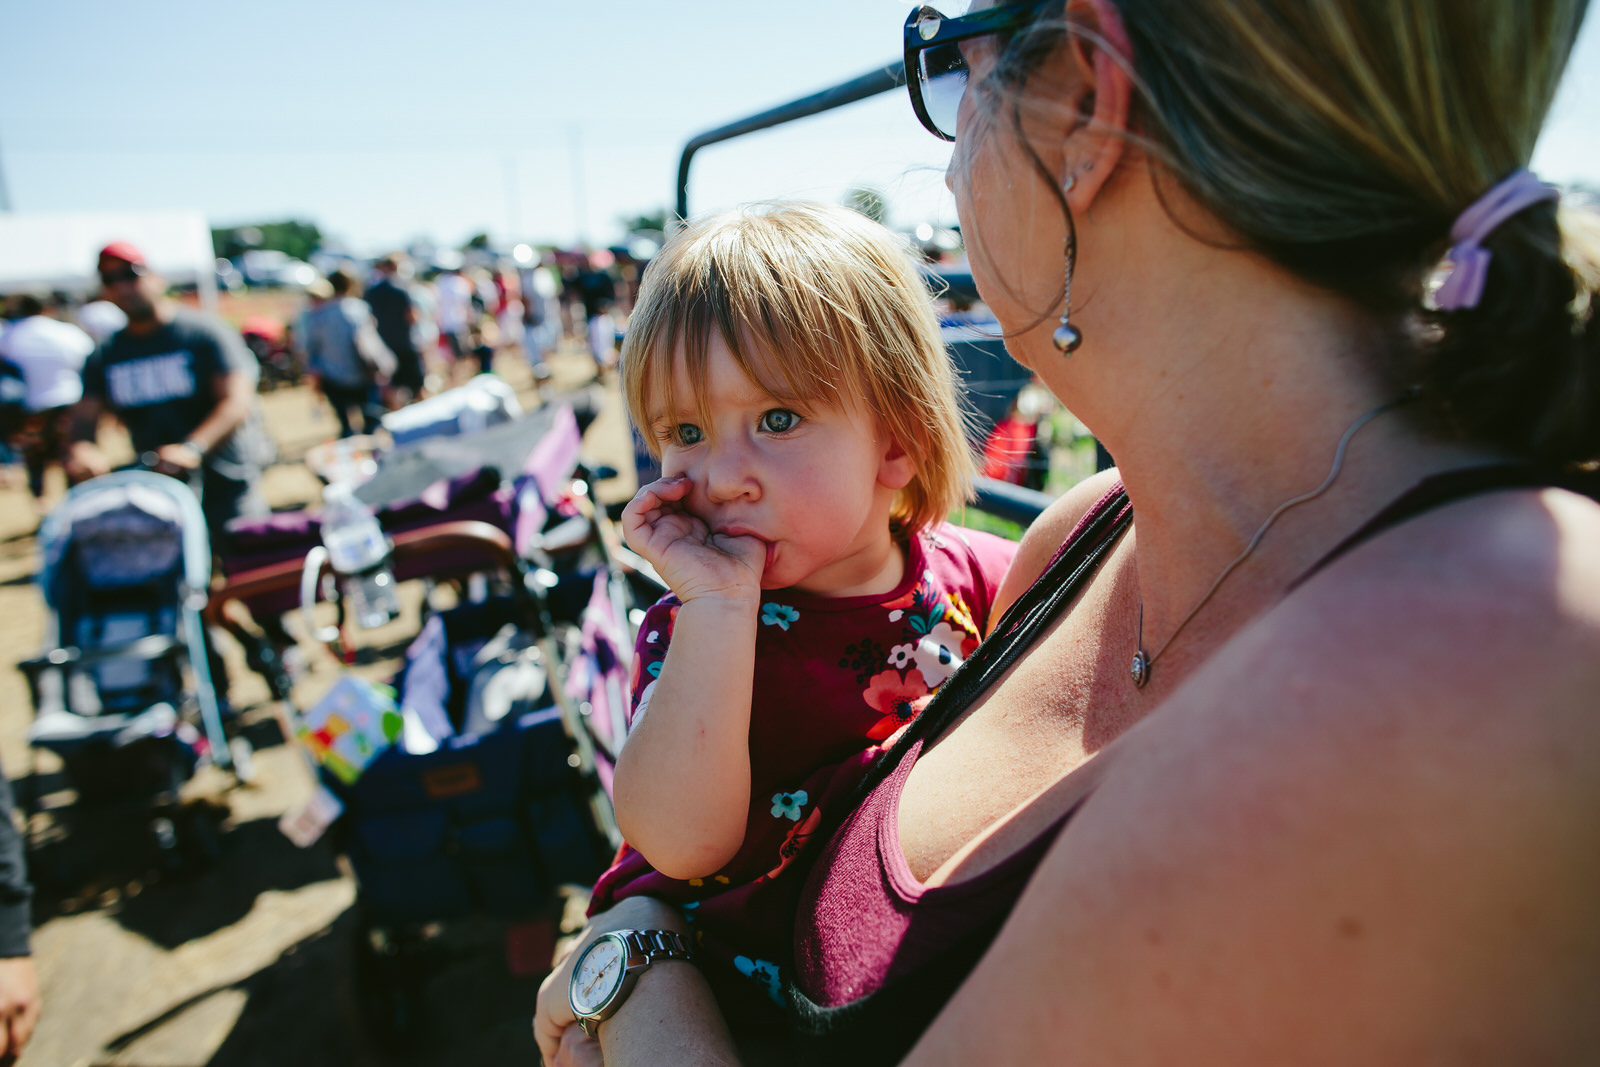 family_documentary_photography_tiny_house_photo_bedners_farmers_market_florida-65.jpg